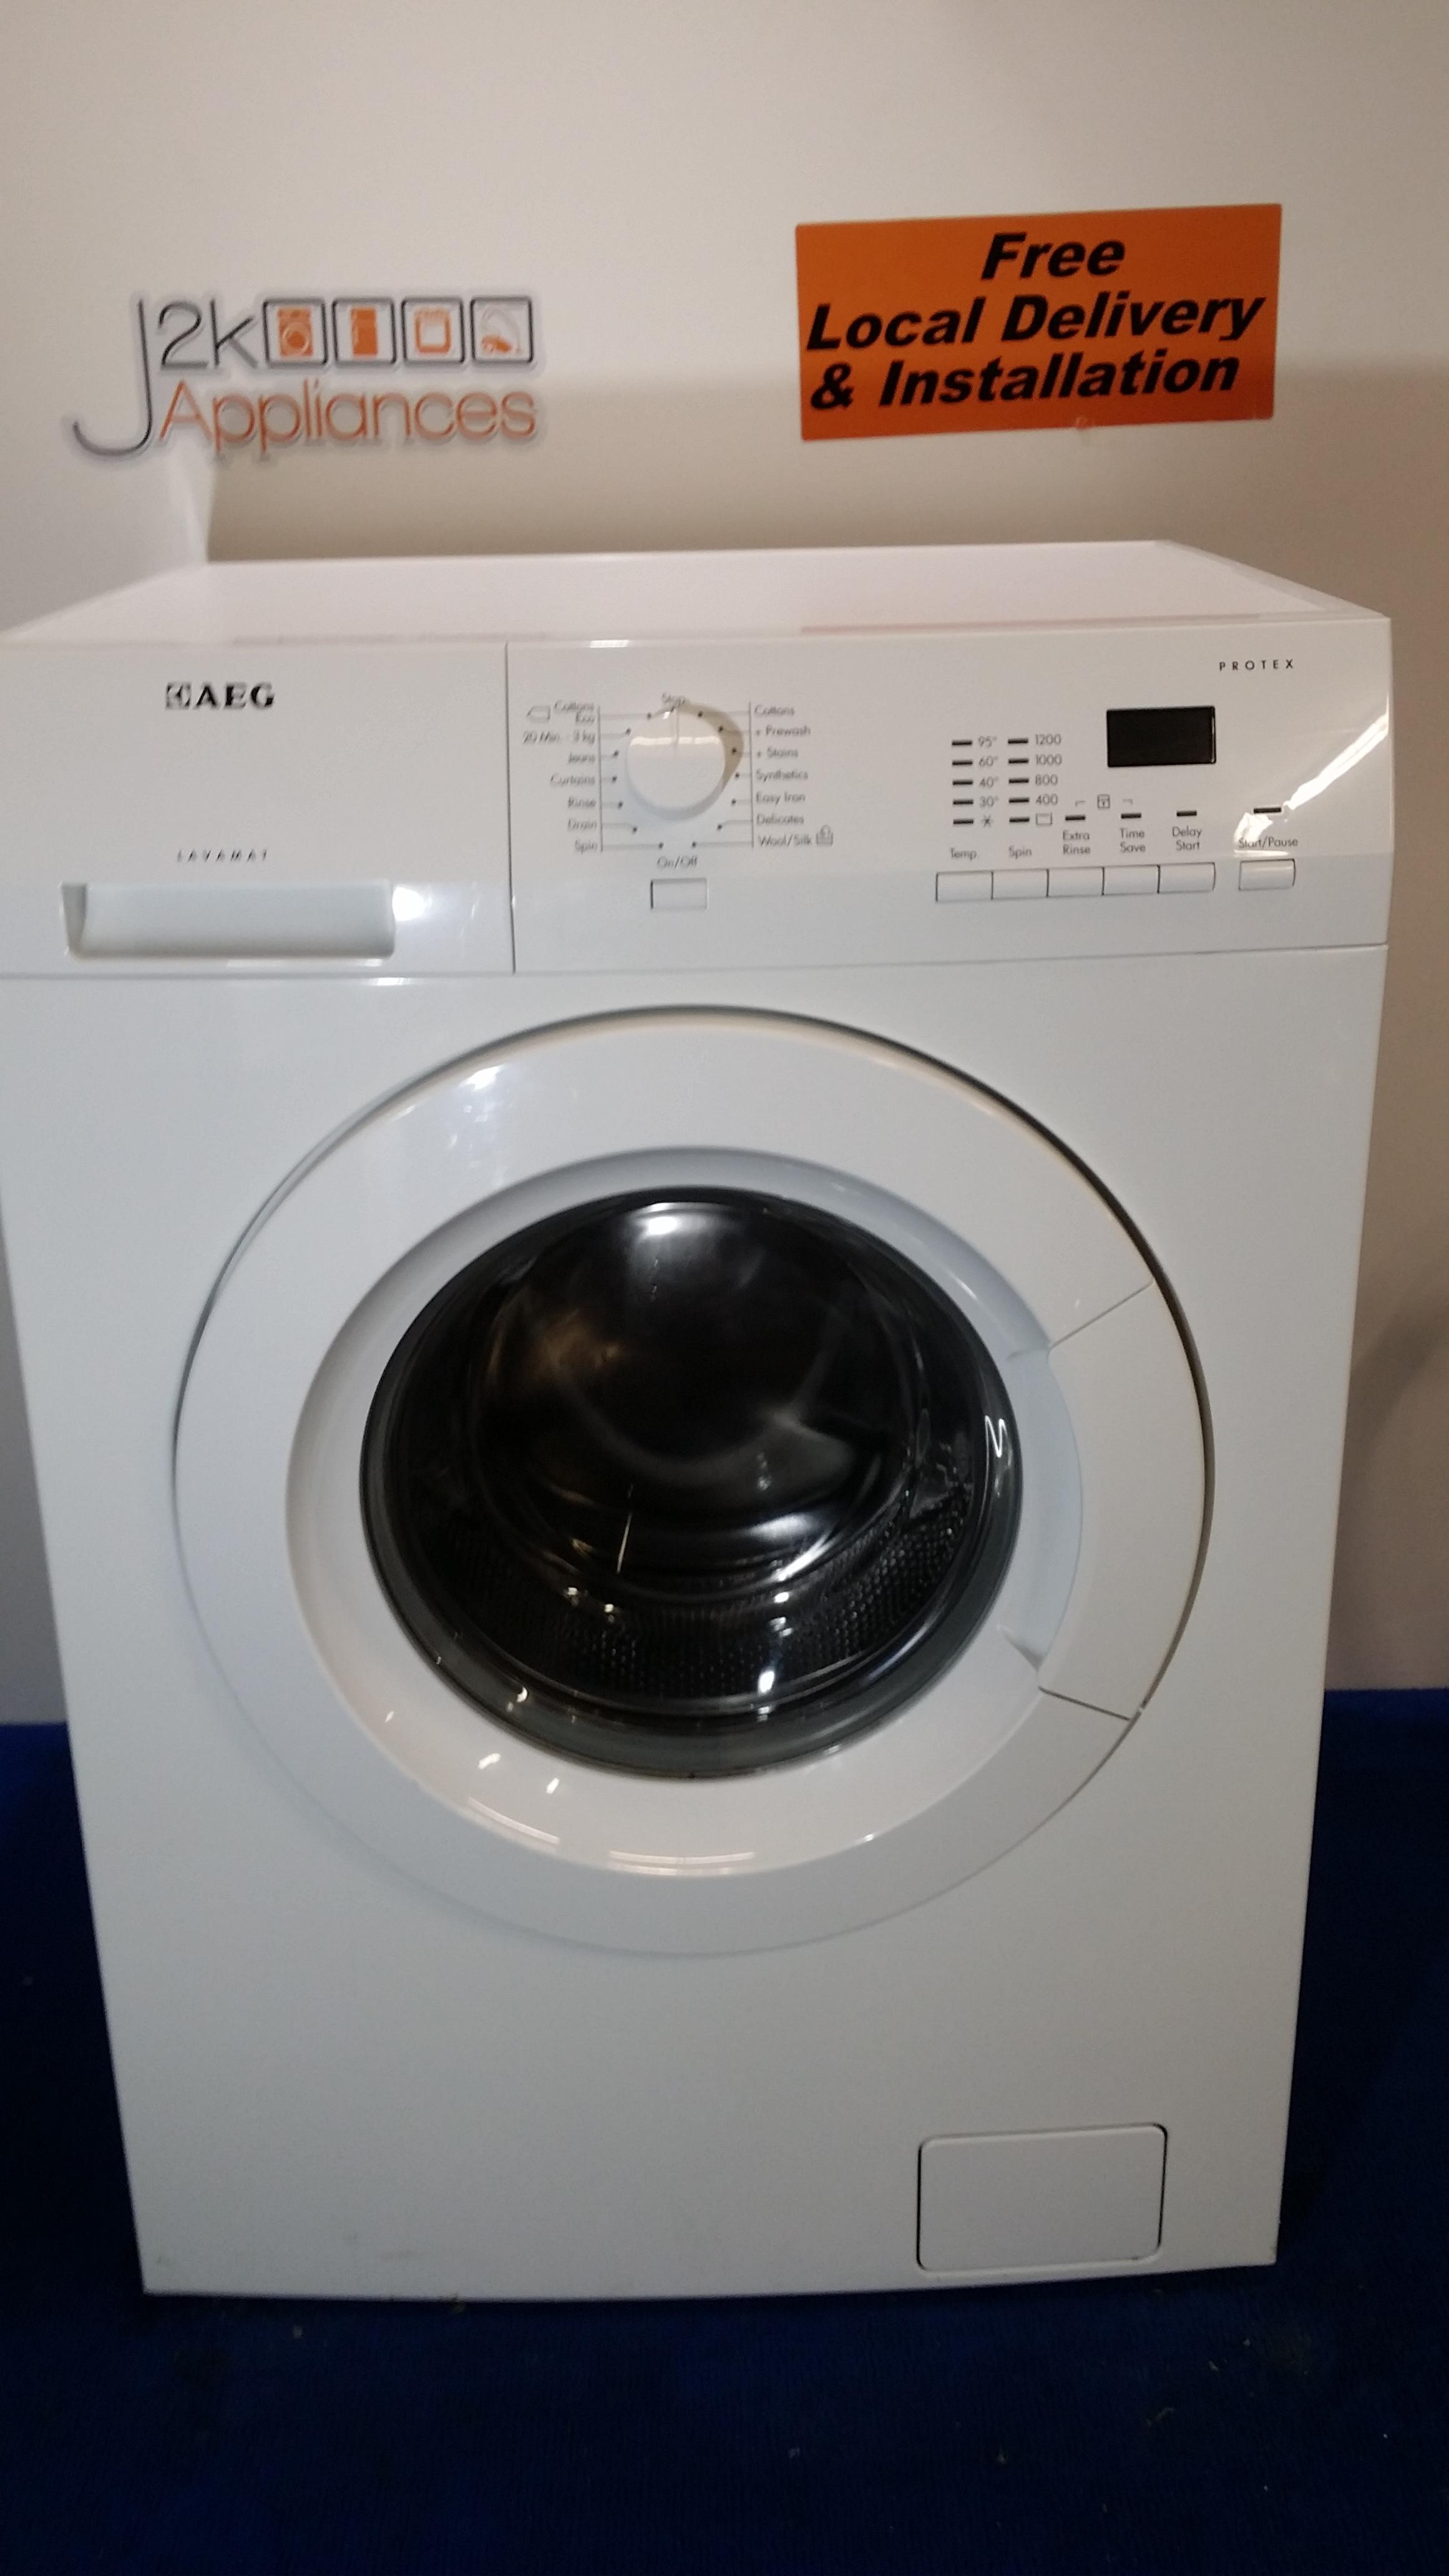 wm159 aeg lavamat 1200 spin 7kg load washing machine. Black Bedroom Furniture Sets. Home Design Ideas